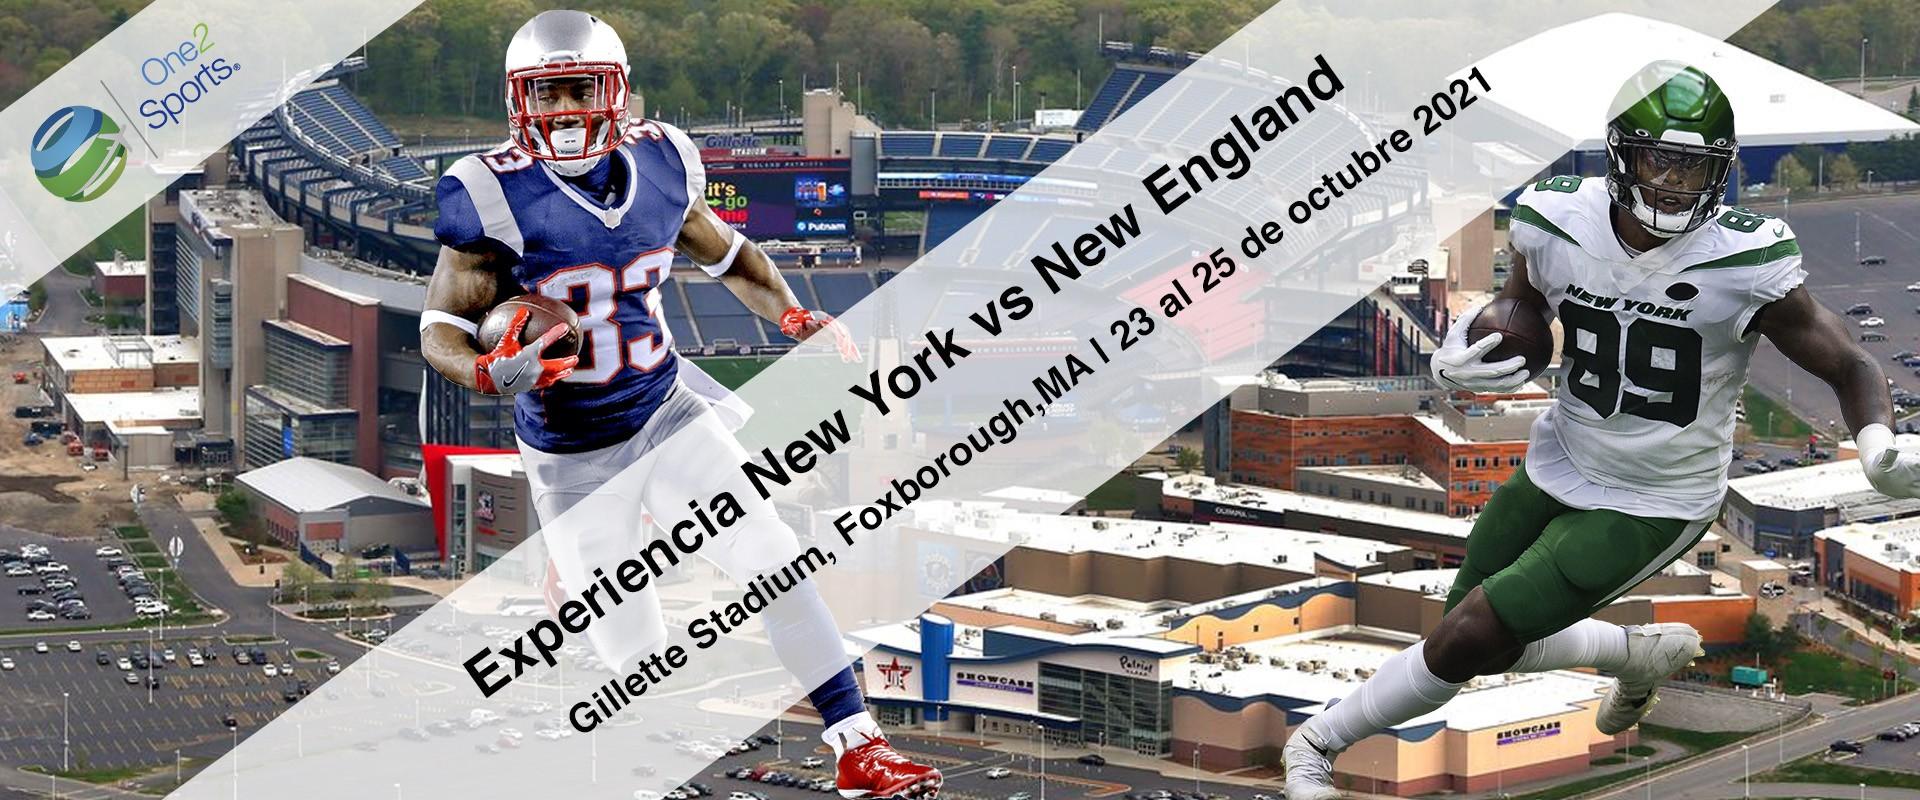 New England vs New York J